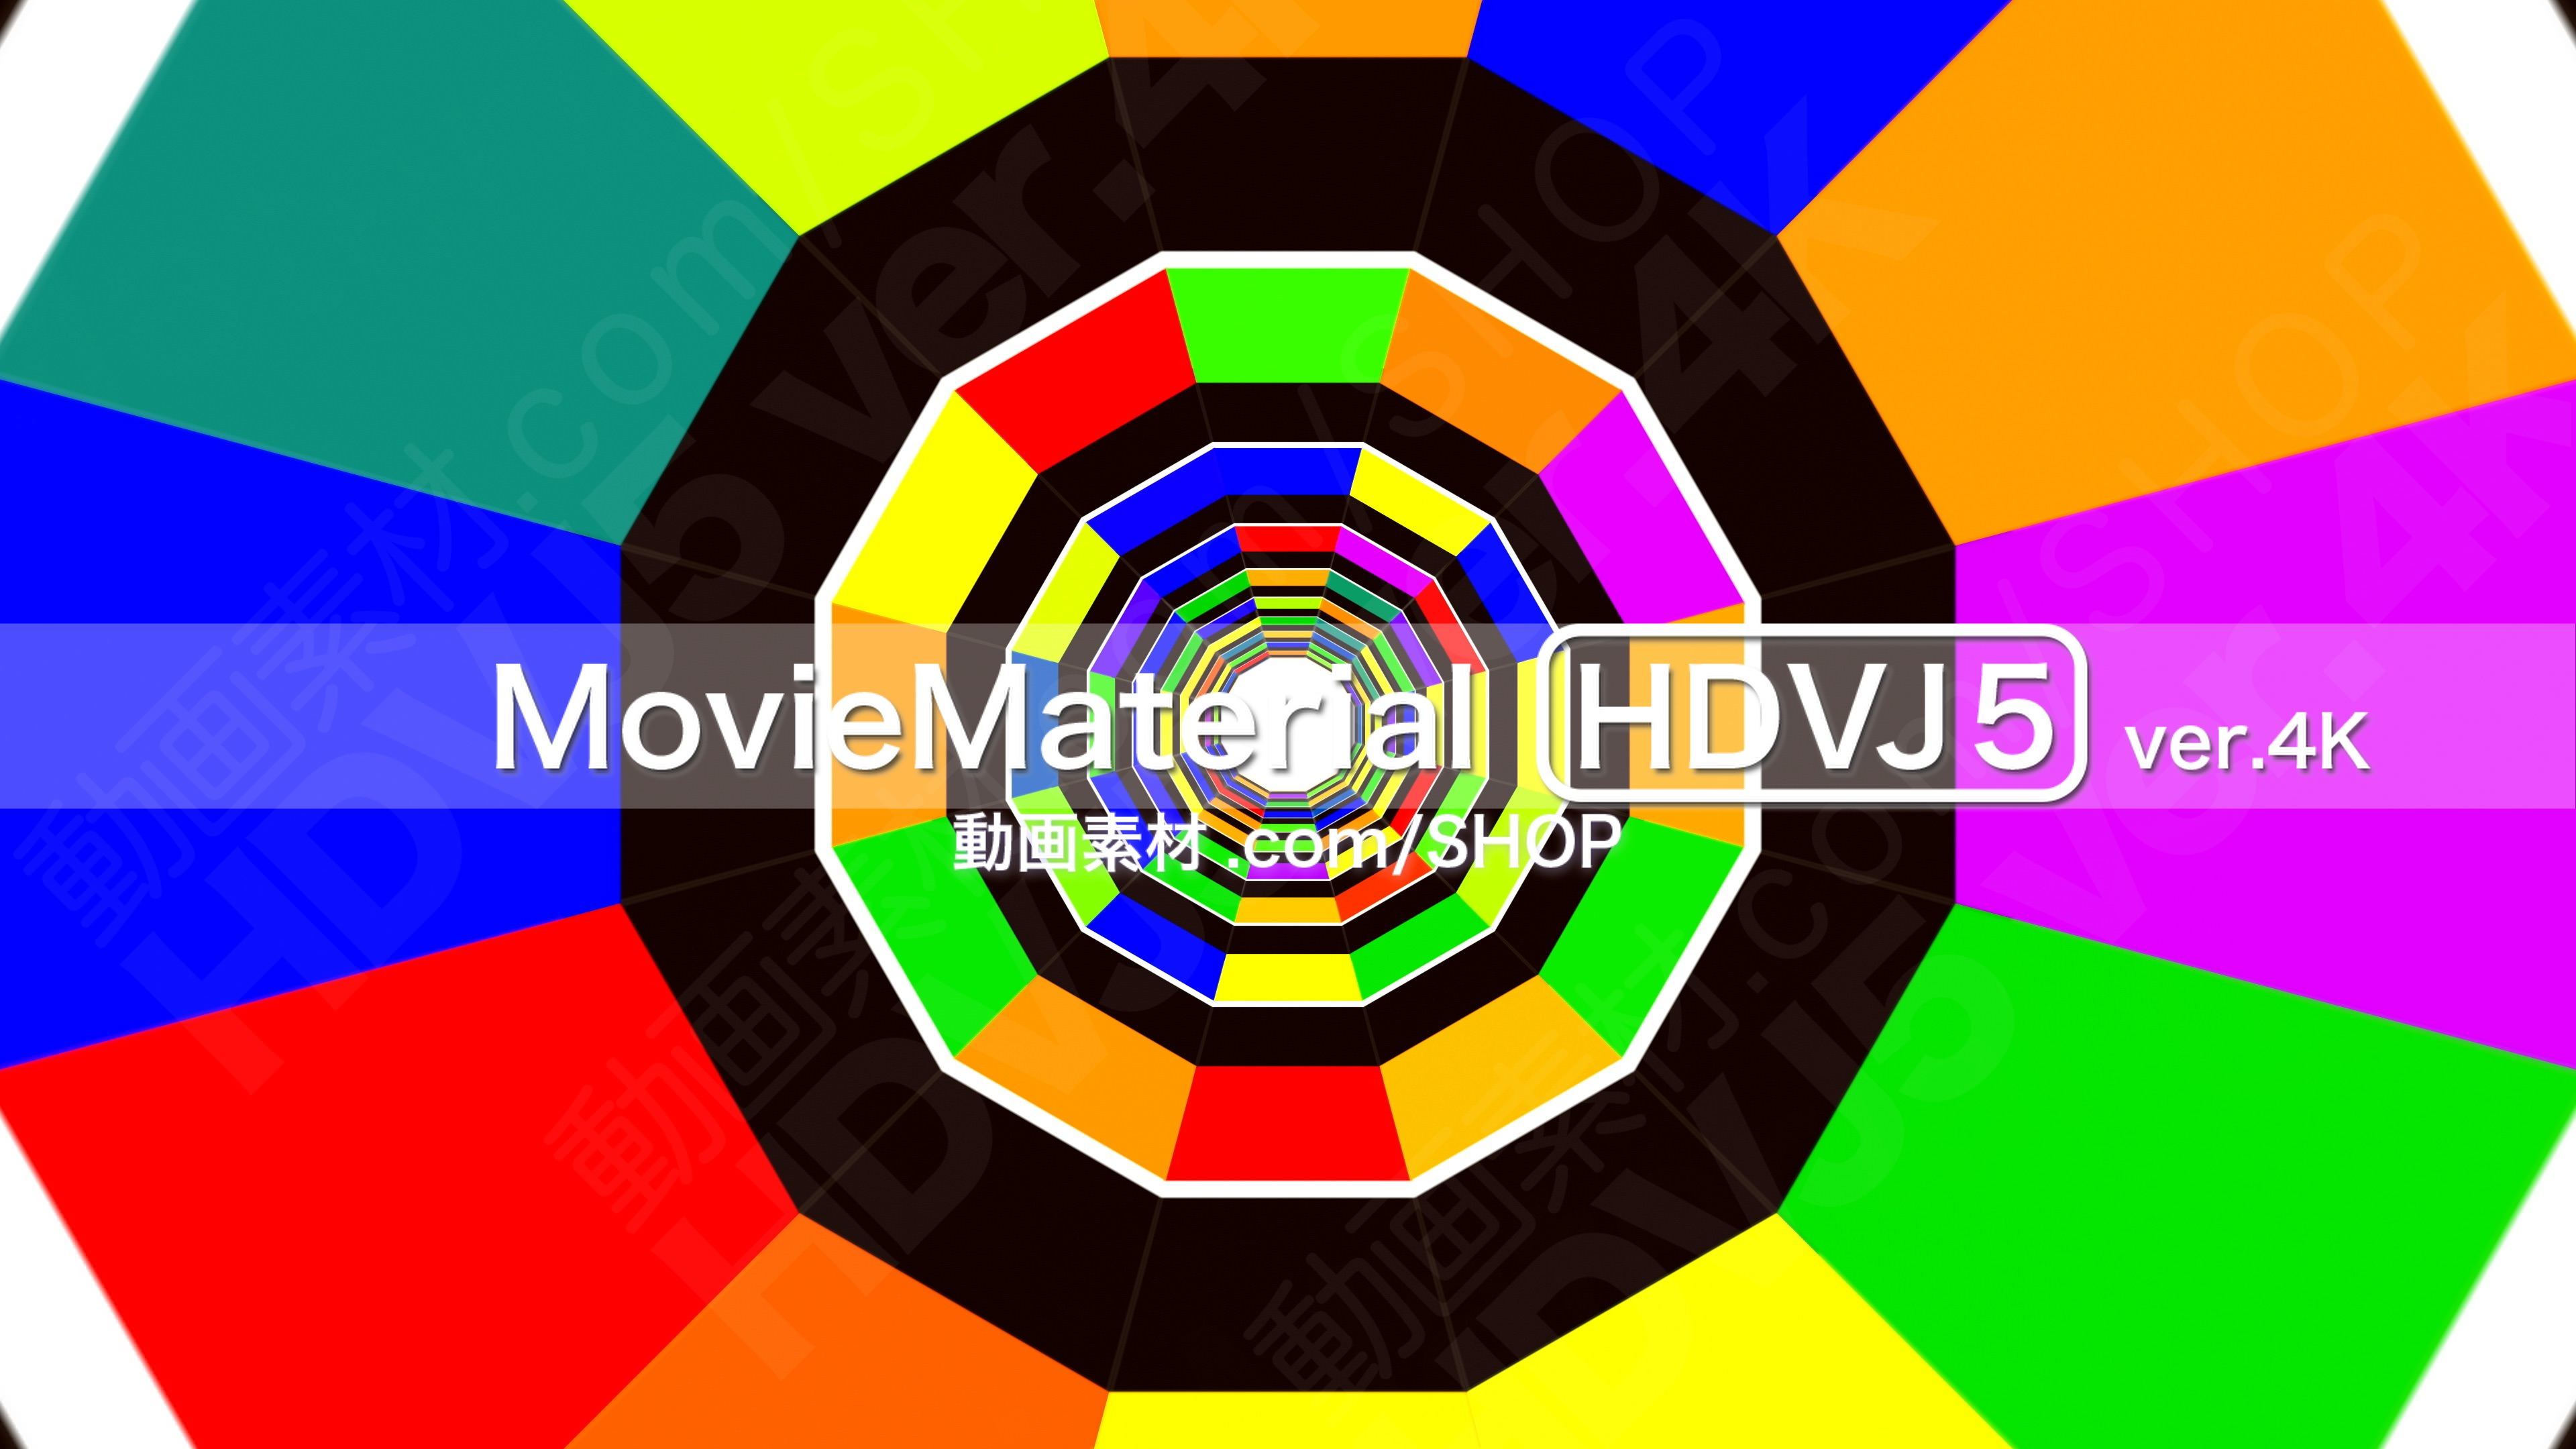 4K2Kループ動画素材集第5段【MovieMaterial HDVJ5 ver.4K】ロイヤリティフリー(著作権使用料無料)2